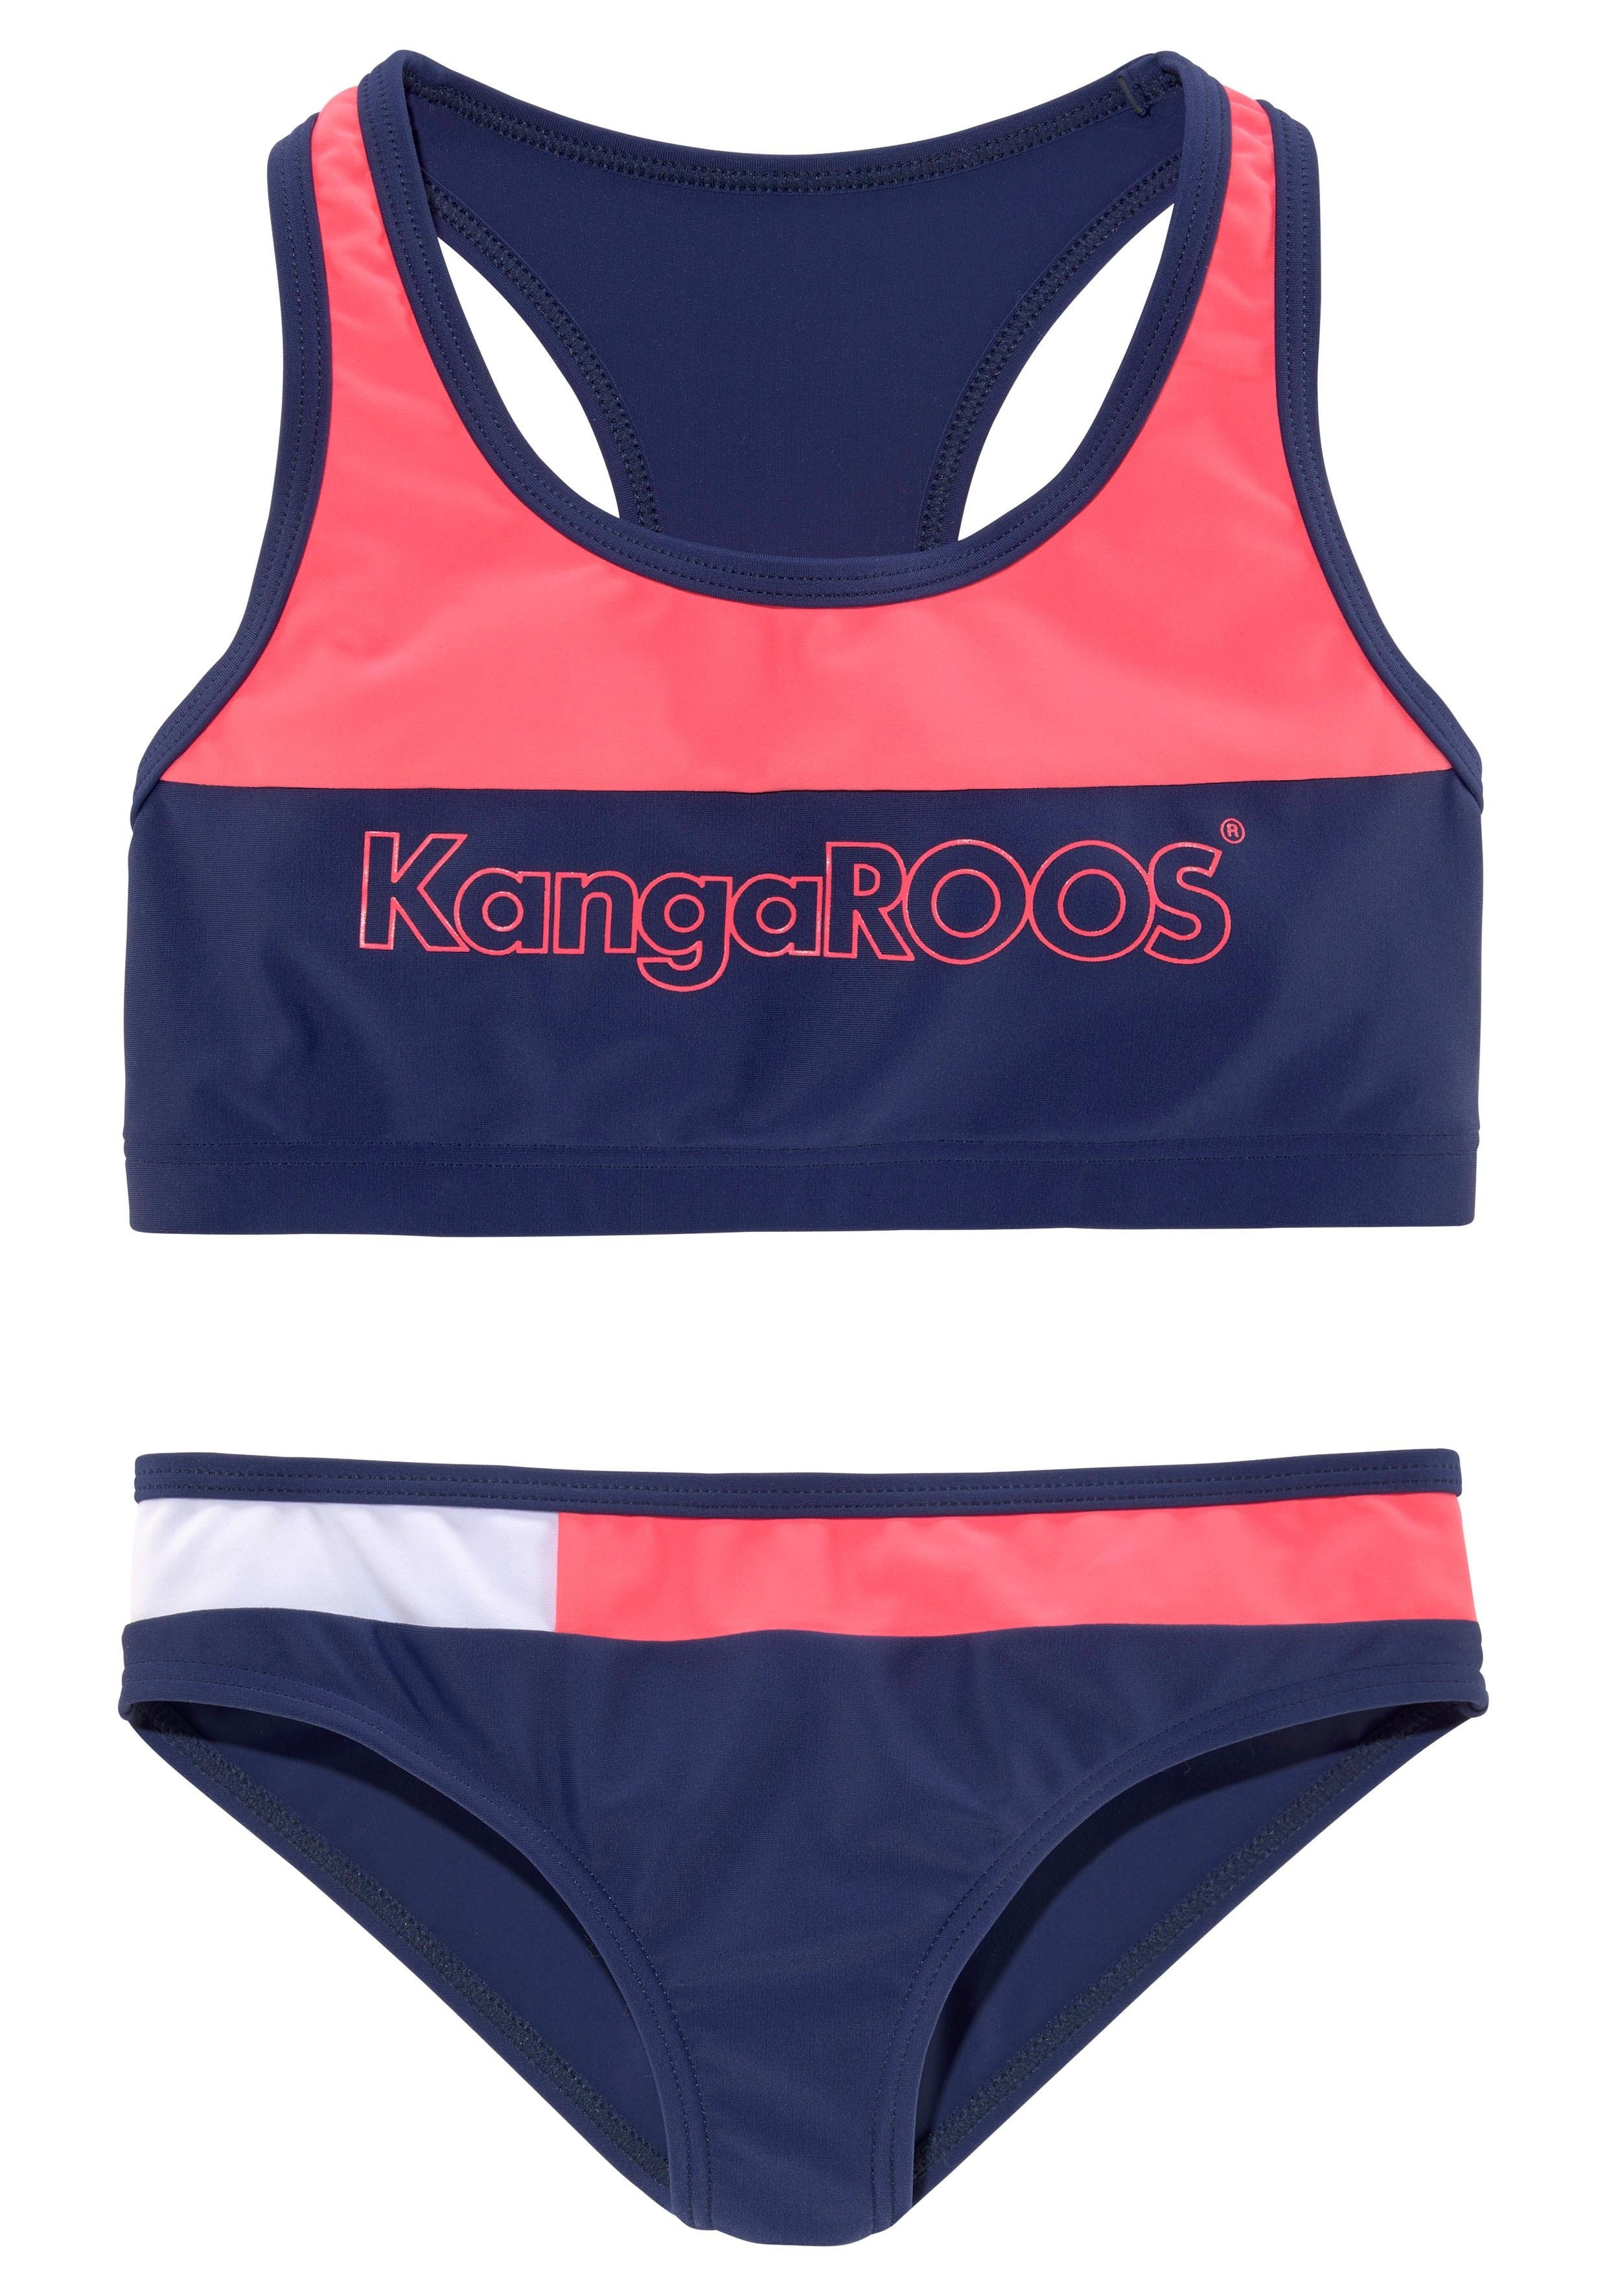 KangaROOS bustierbikini bij OTTO online kopen